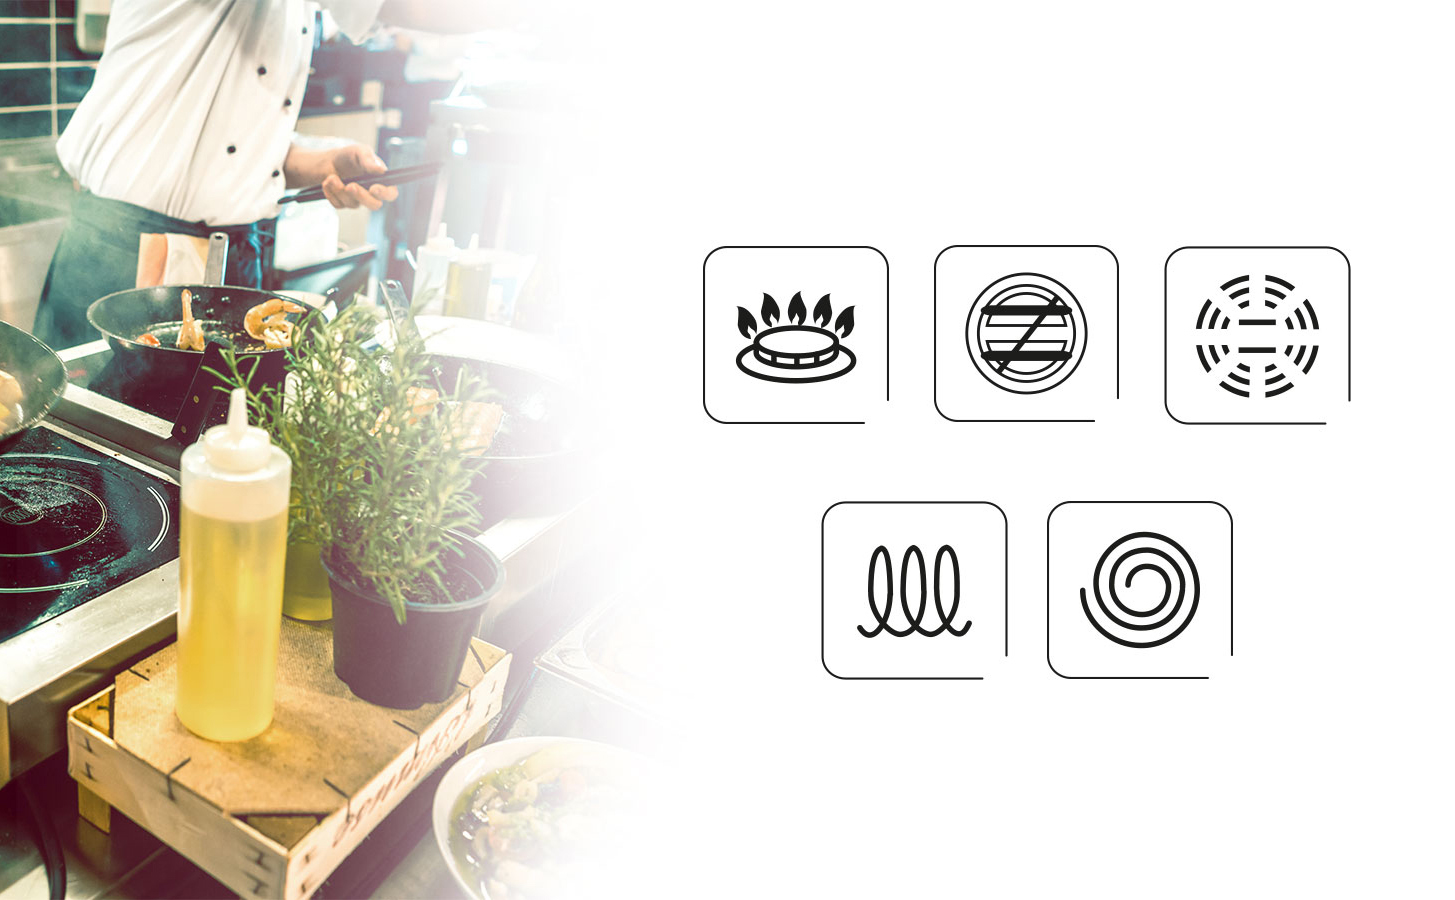 Smile MGK-07 Batería de Cocina Inducción 9 piezas Acero Inoxidable 4 ollas, 1 cazo, 4 tapas cristal, apta para todo tipo de cocinas, libre PFOA